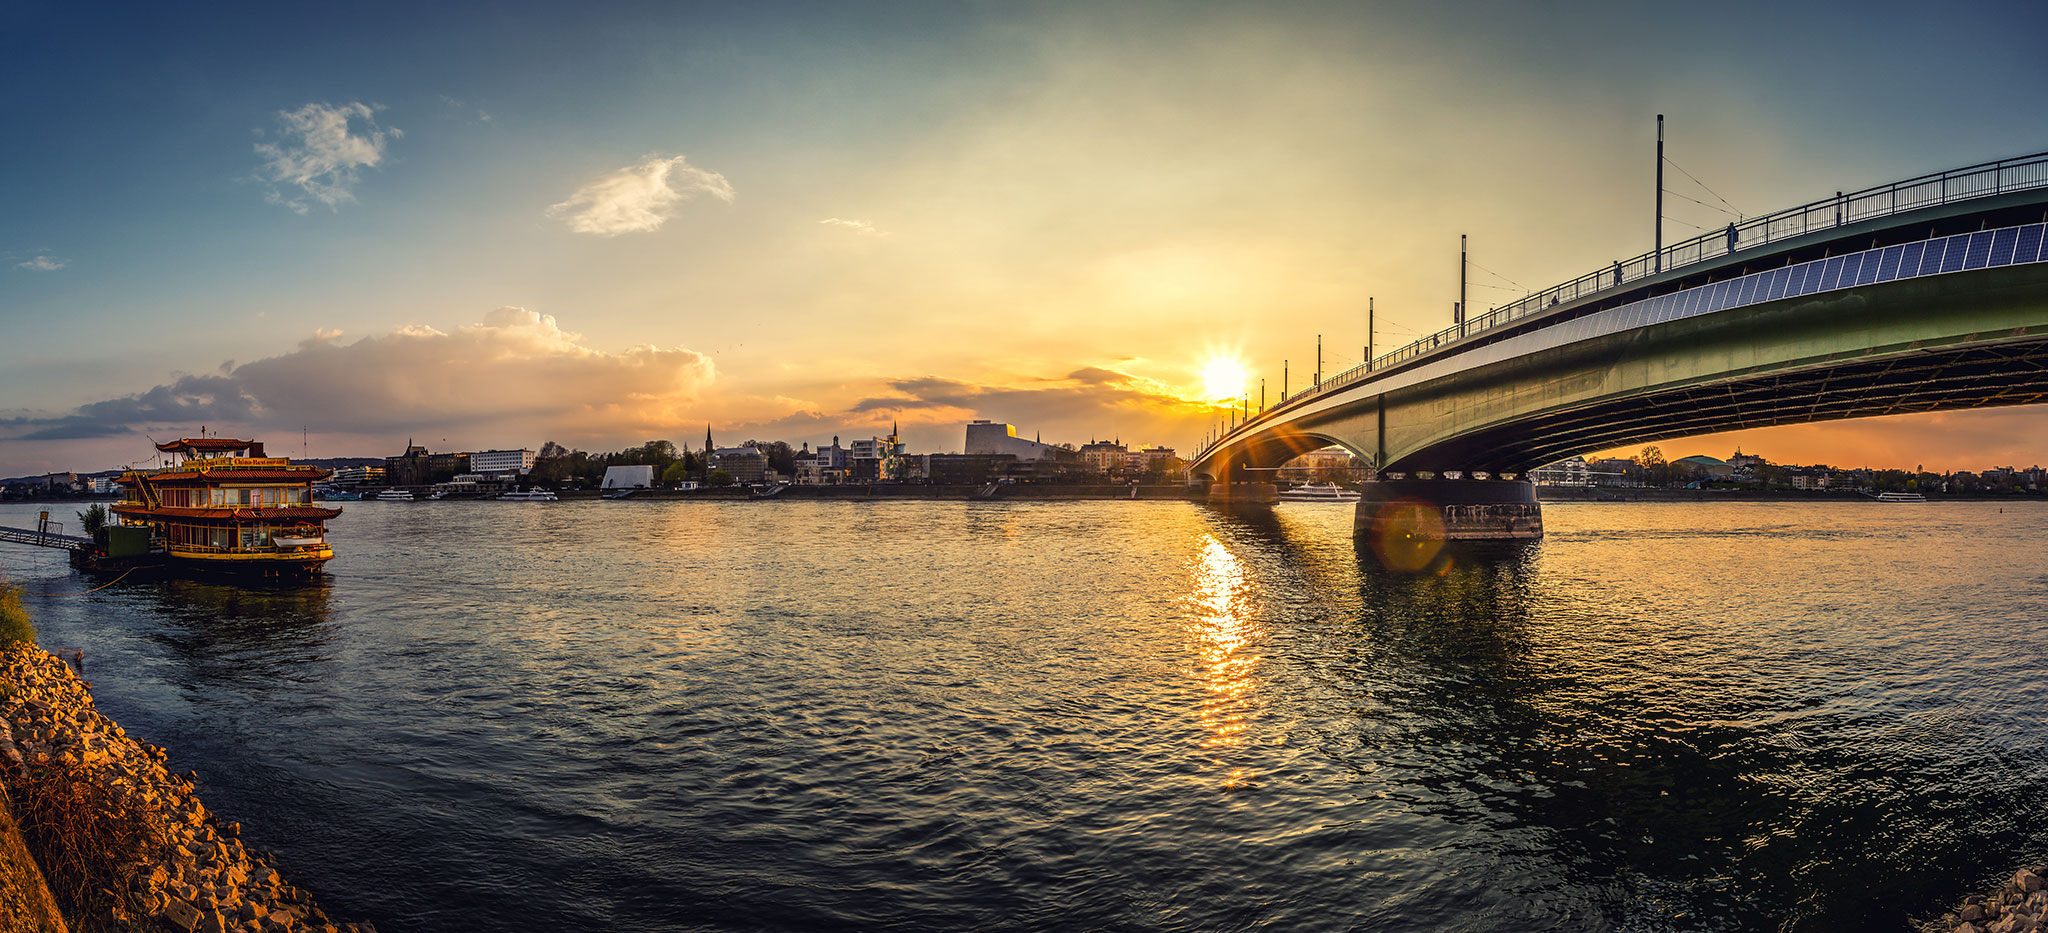 Sunset at Kennedy Bridge, Bonn, Germany